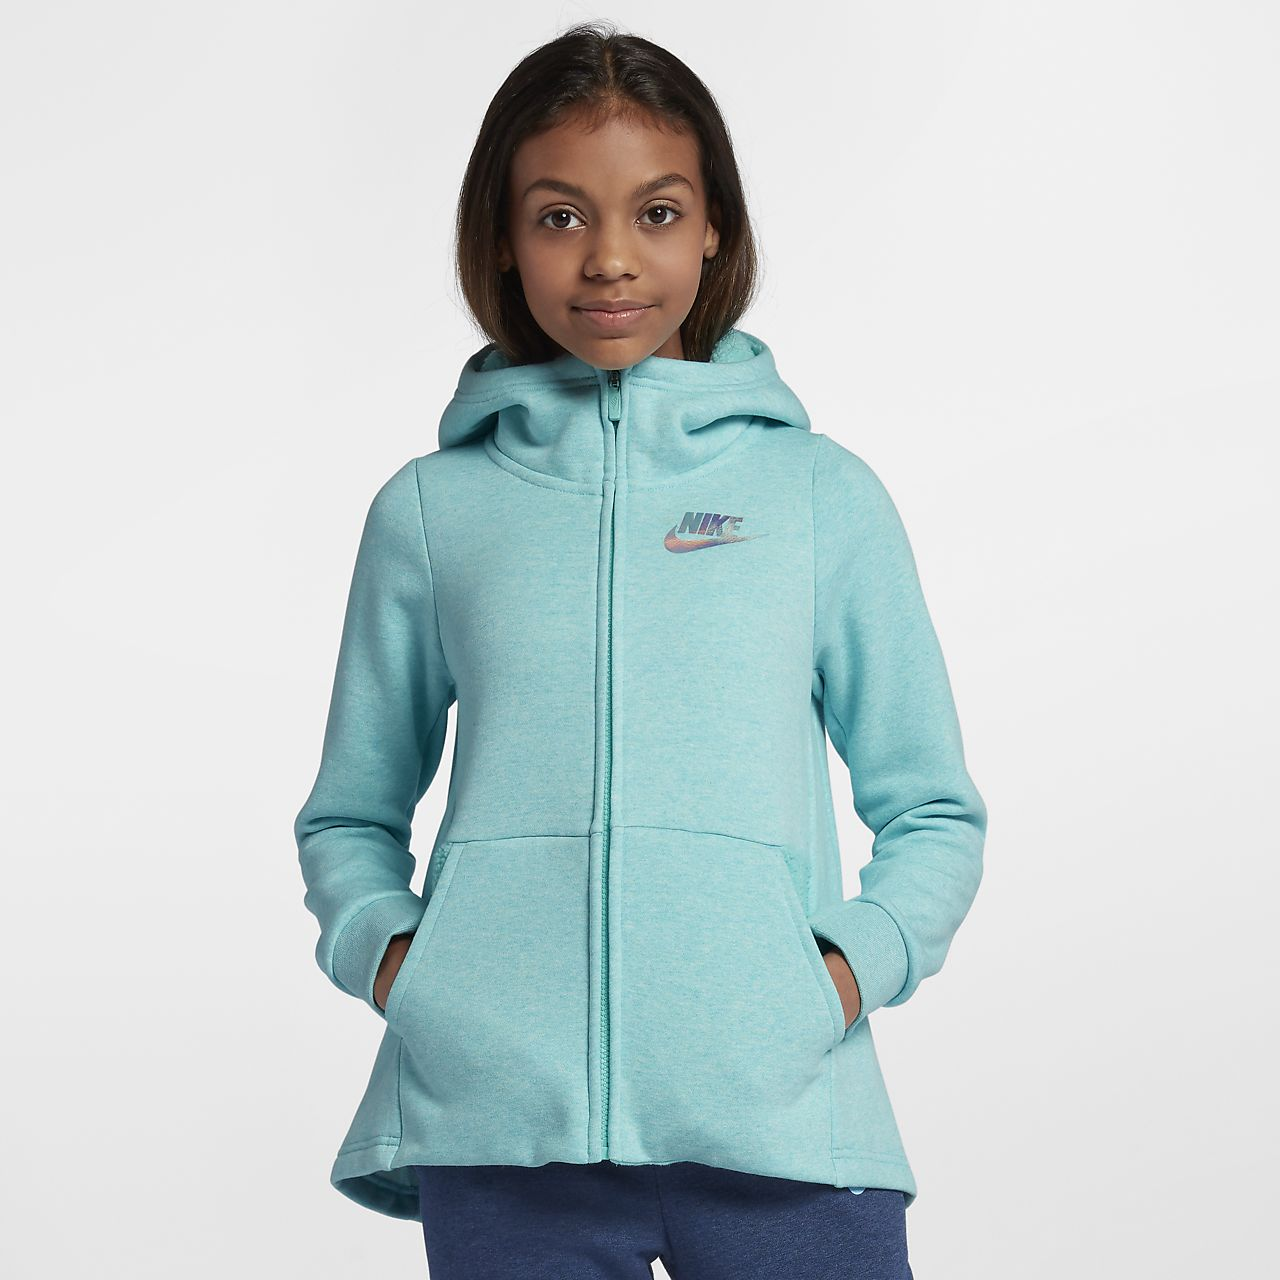 013fb1ab6bde97 Nike Sportswear Big Kids  (Girls ) Full-Zip Hoodie. Nike.com